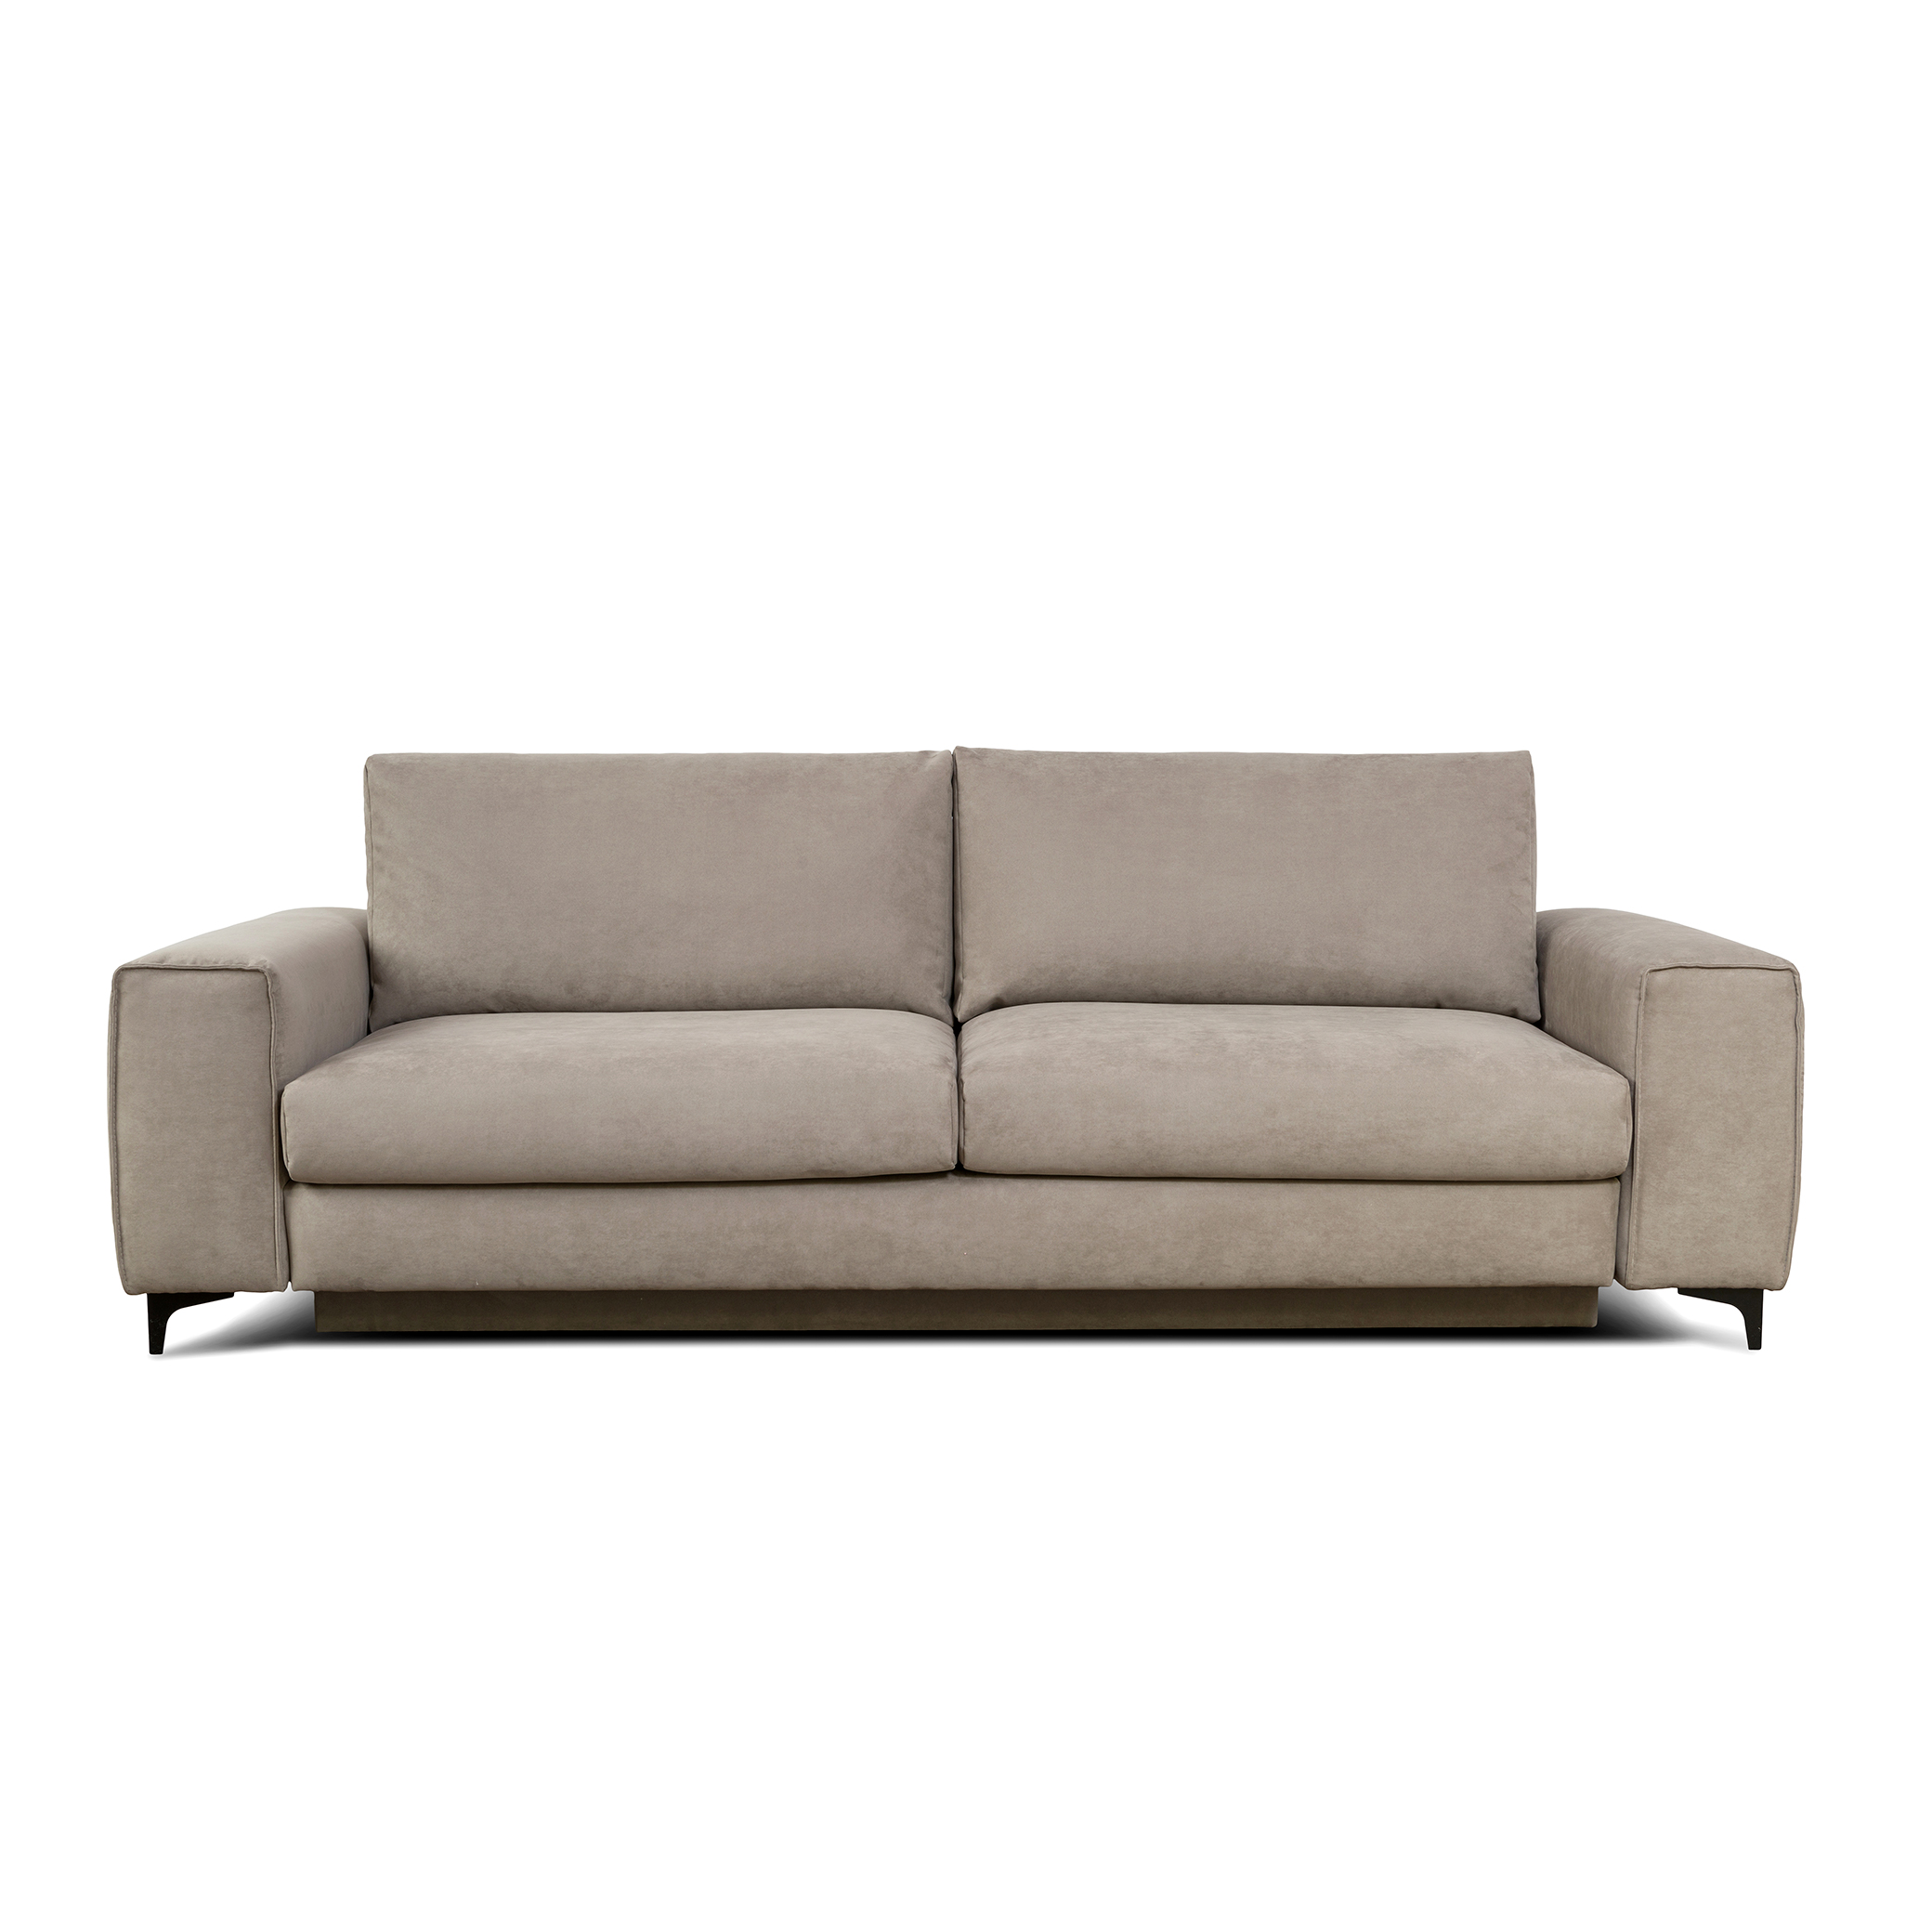 MOON Sofa 3 osobowa – Boki L  loading='lazy'